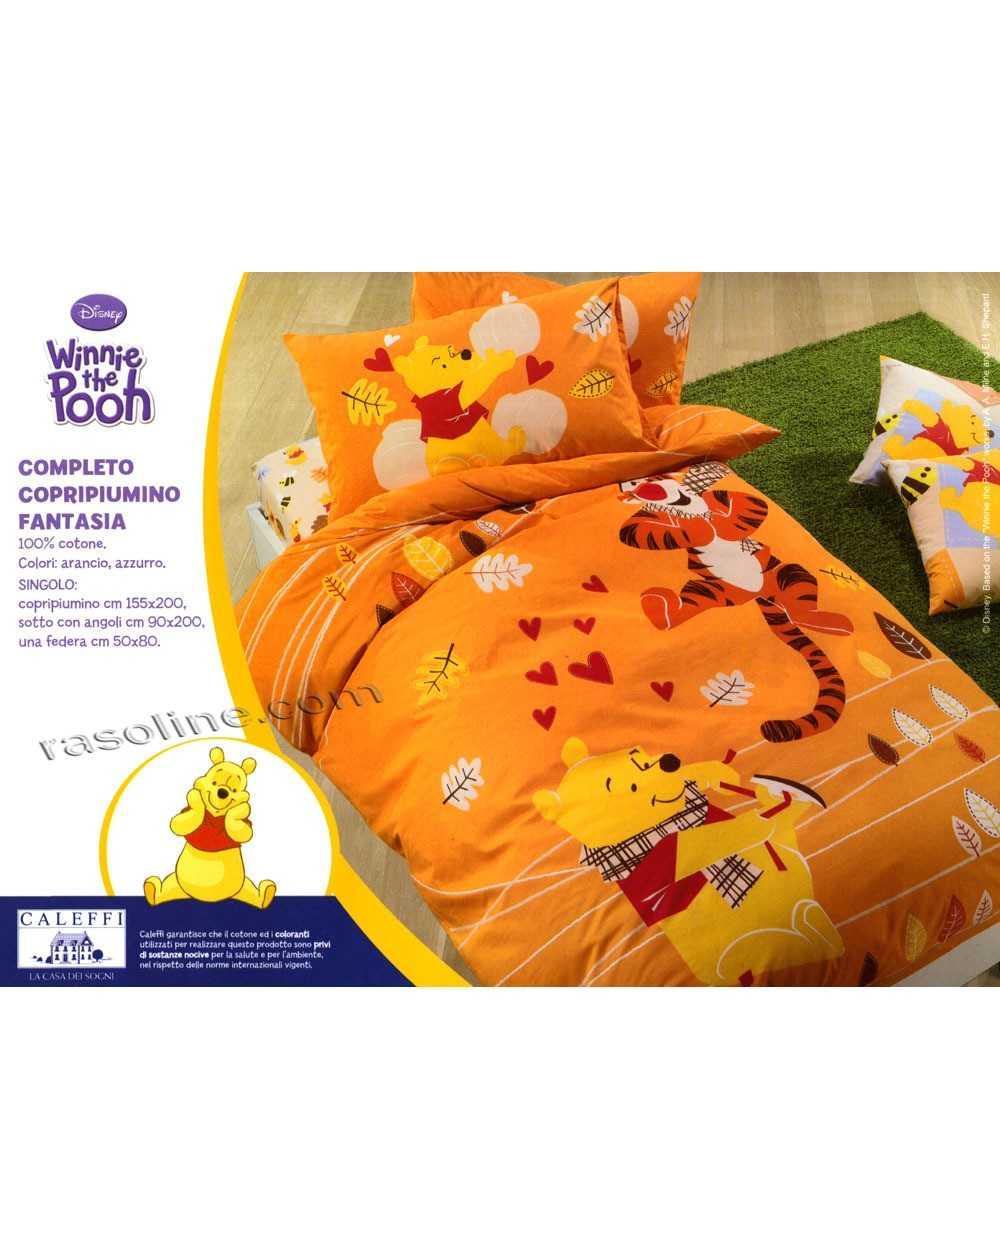 Copripiumino Singolo Winnie The Pooh.Copripiumino Completo Letto Singolo Winnie The Pooh Fantasia Arancio